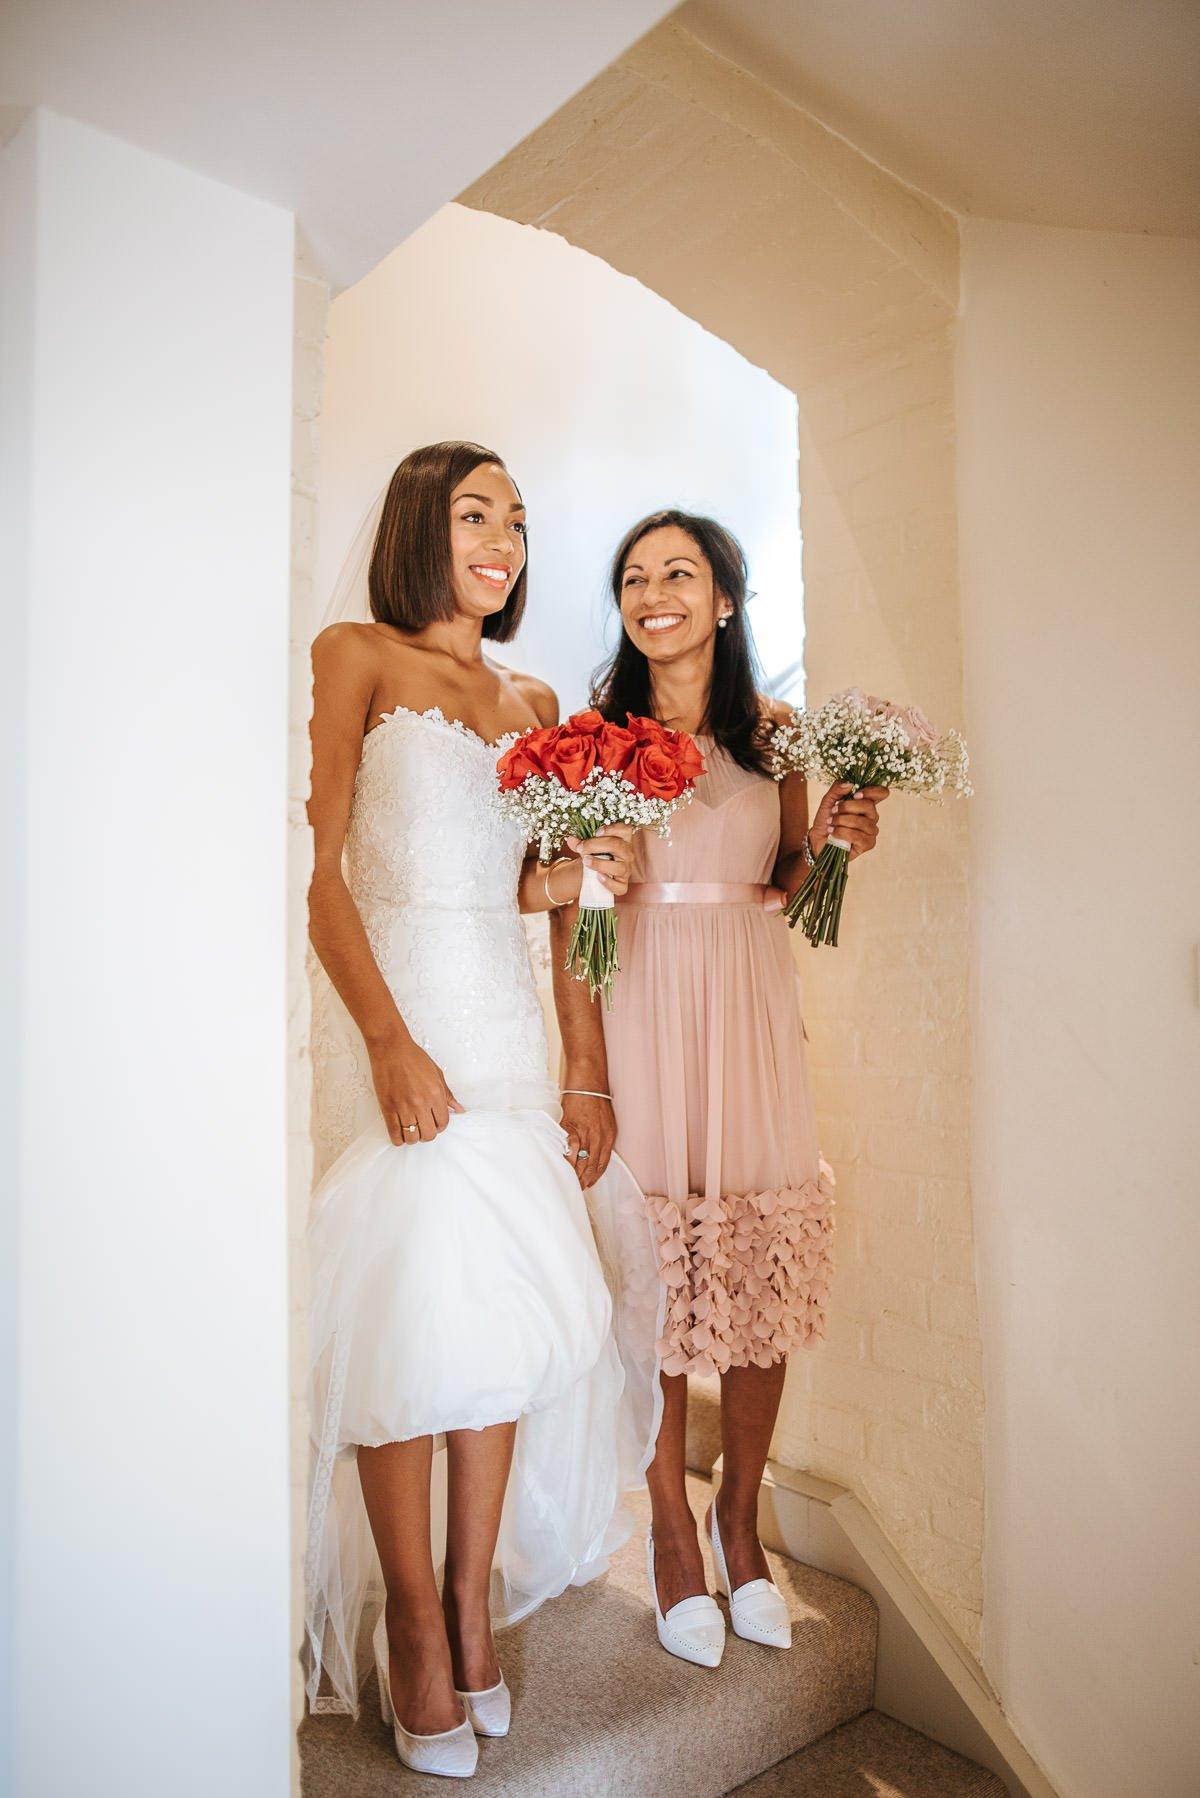 wedding-photographer-hampshire-33 34